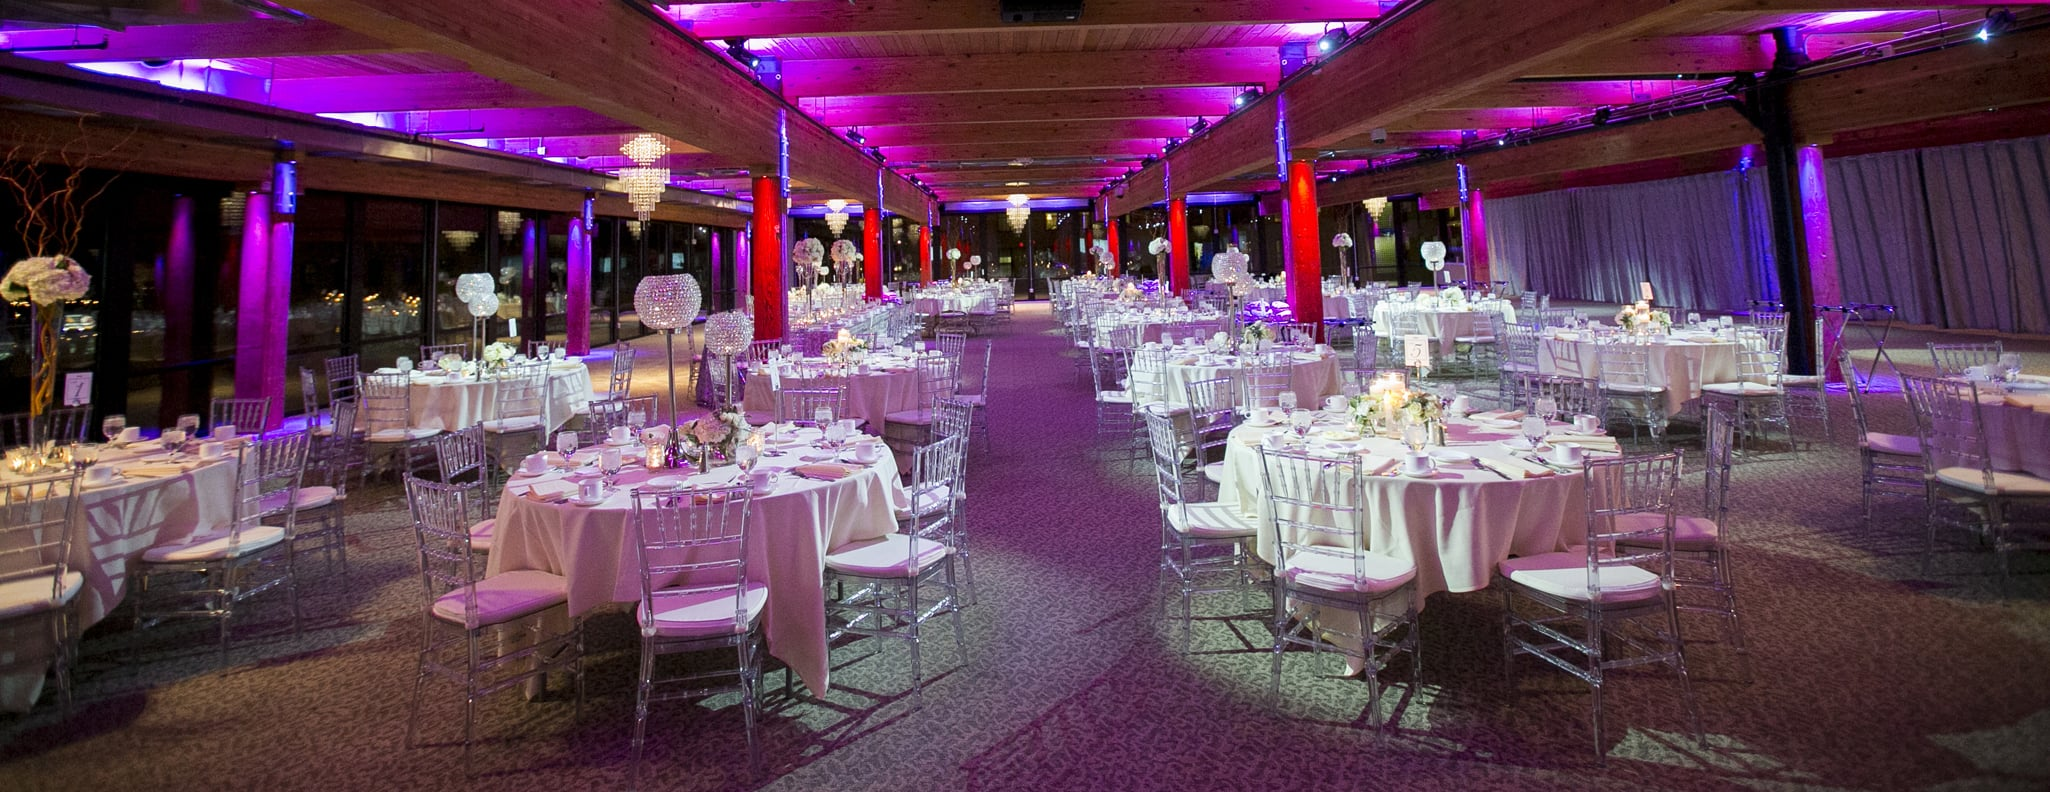 Millennium minneapolis wedding